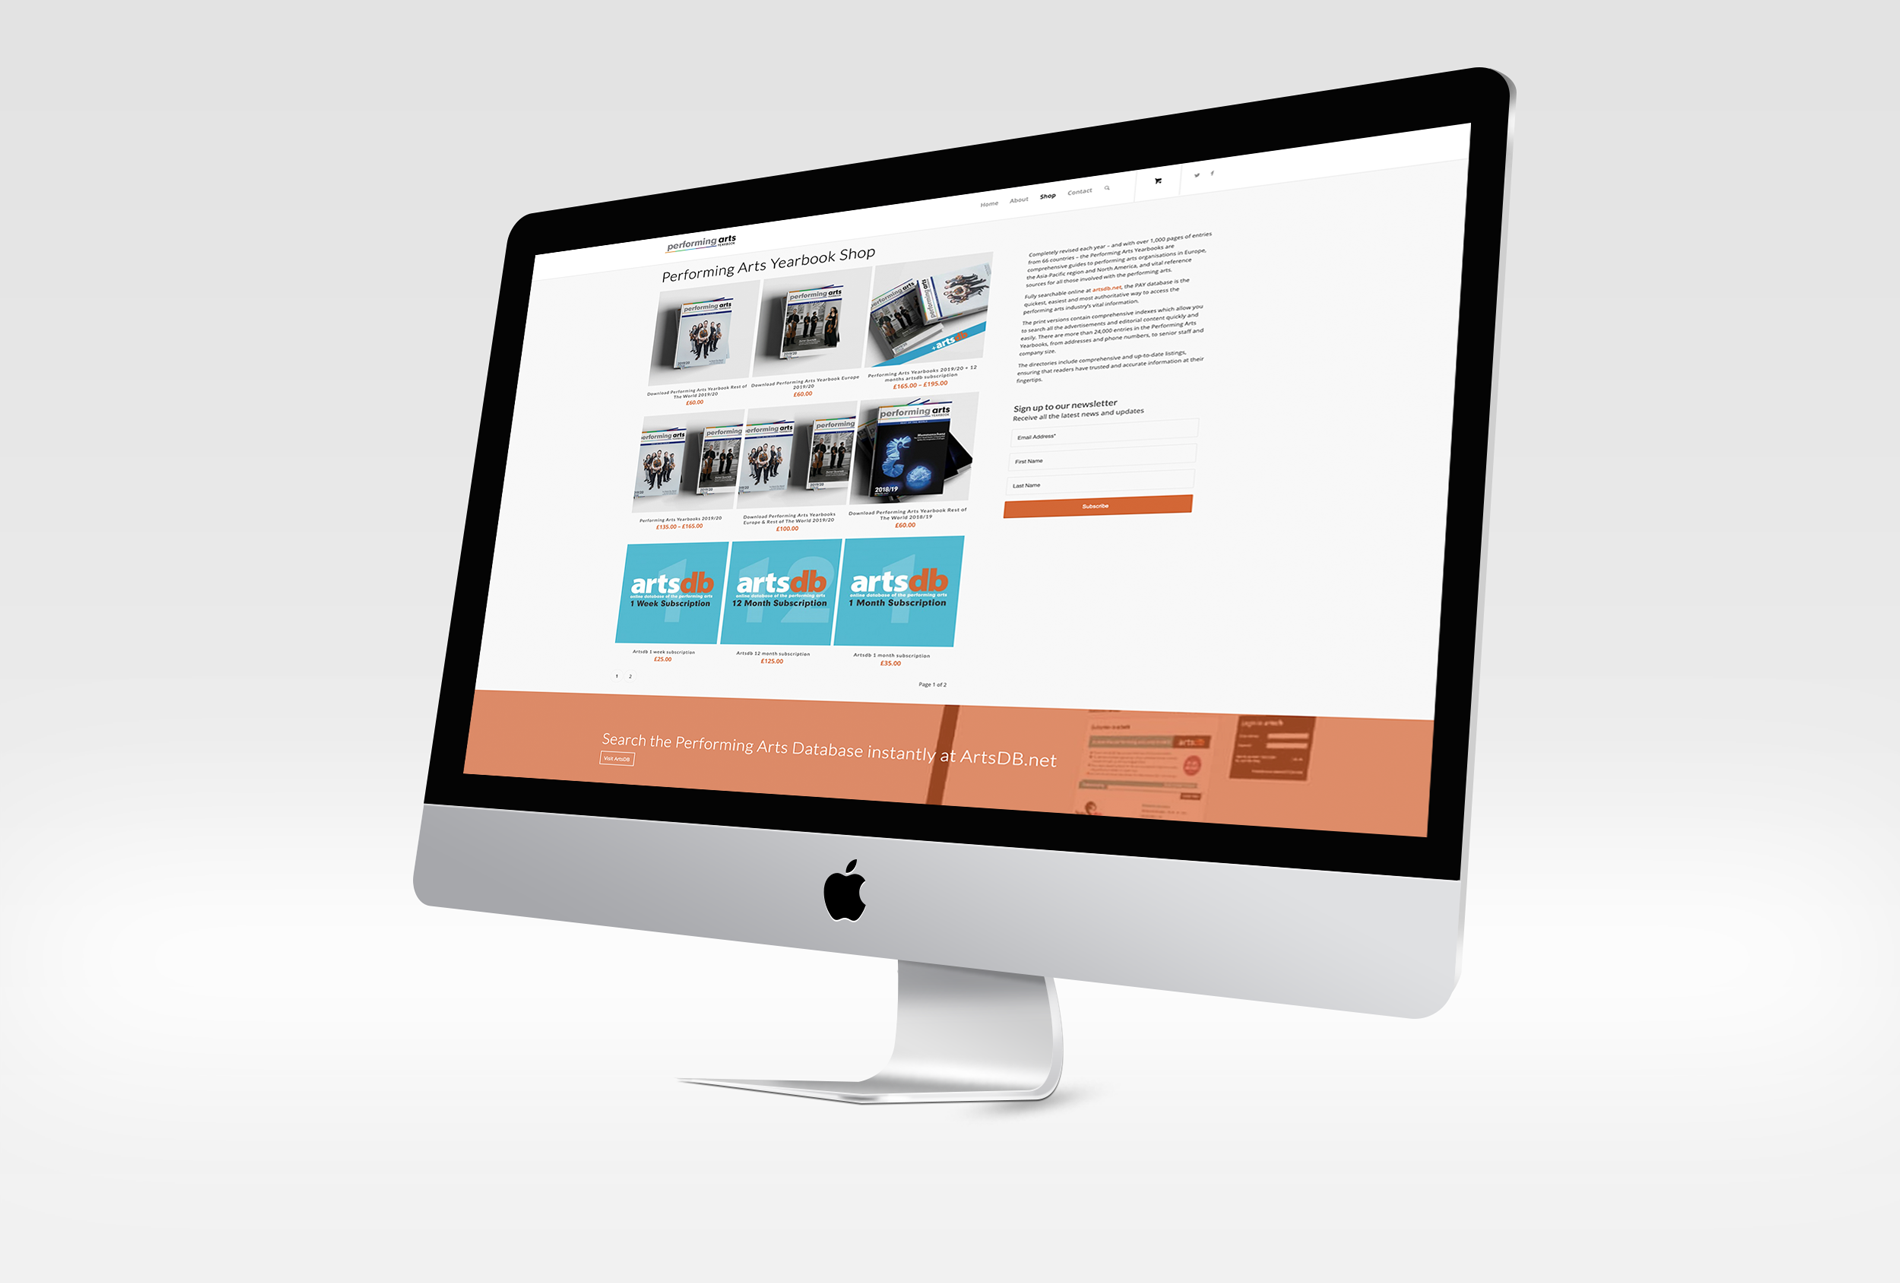 PAYB demo screen